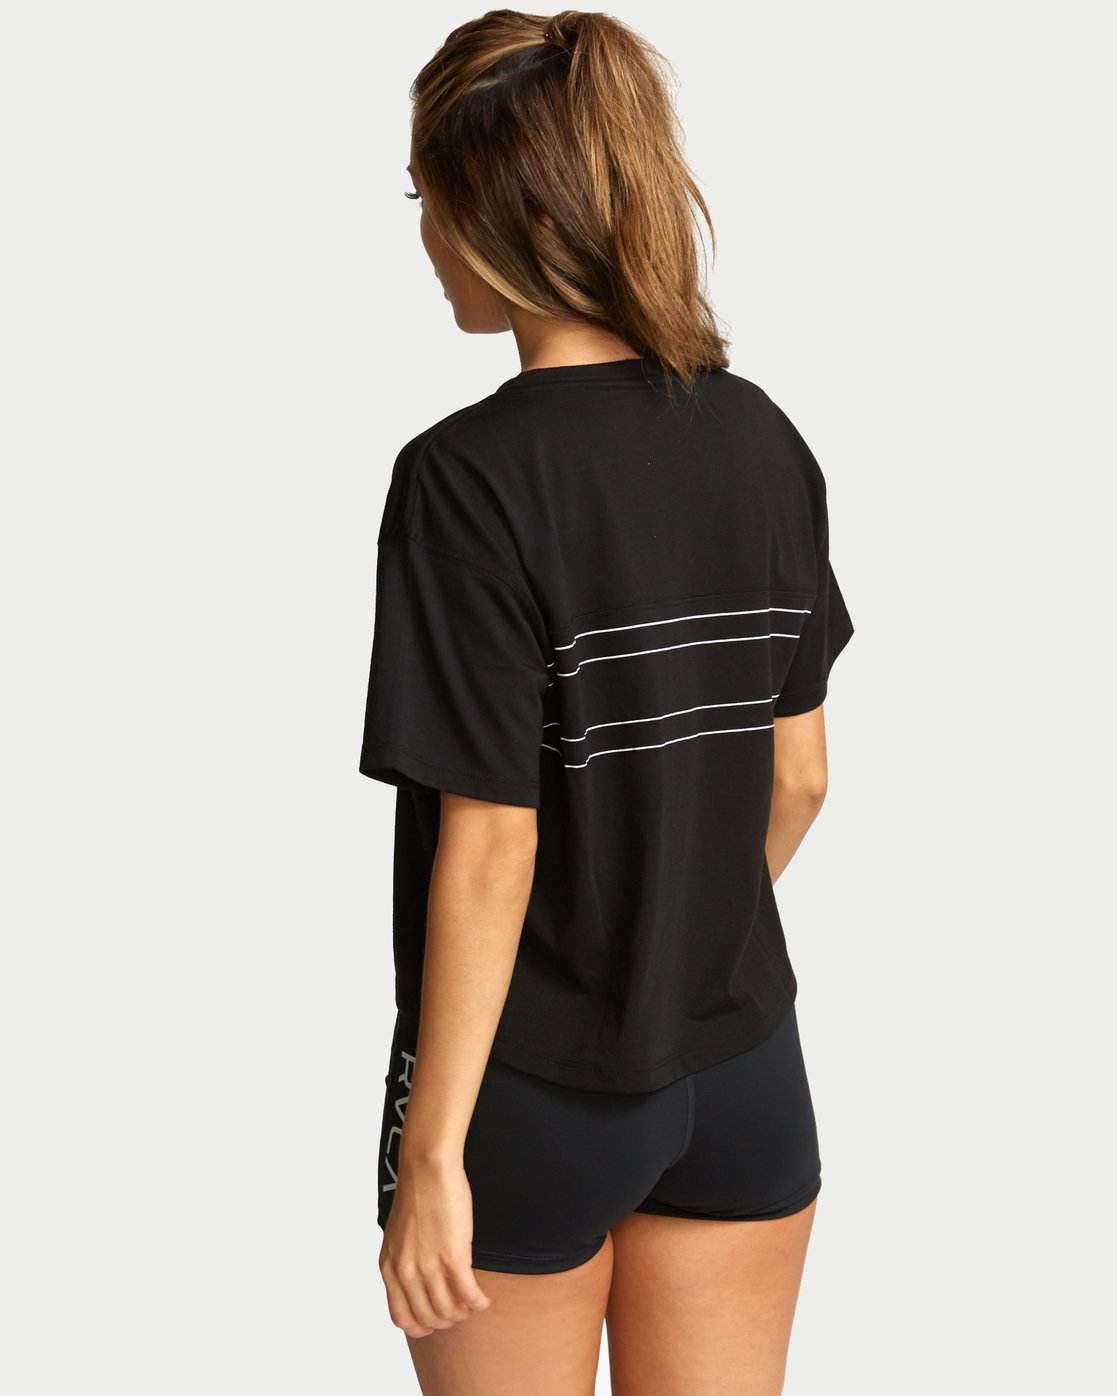 3 V Boxy  - hort Sleeve Sports T-Shirt  Q4TPWDRVF9 RVCA